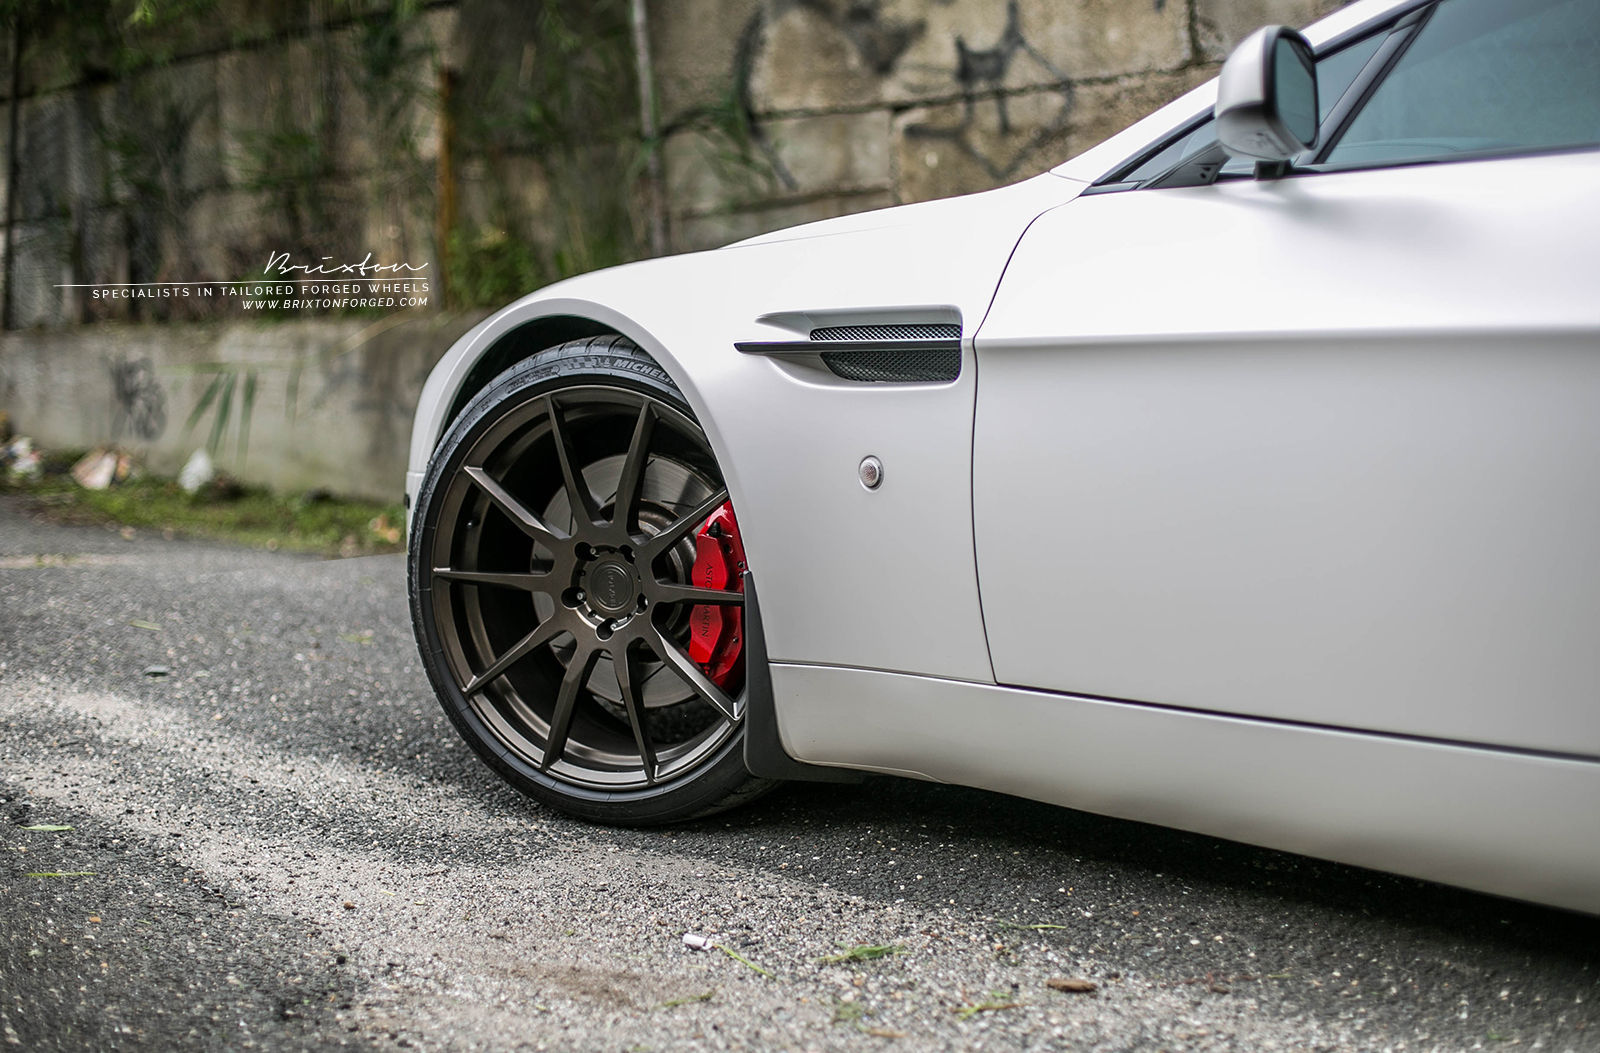 Aston Martin V8 Vantage | Aston Martin V8 Vantage